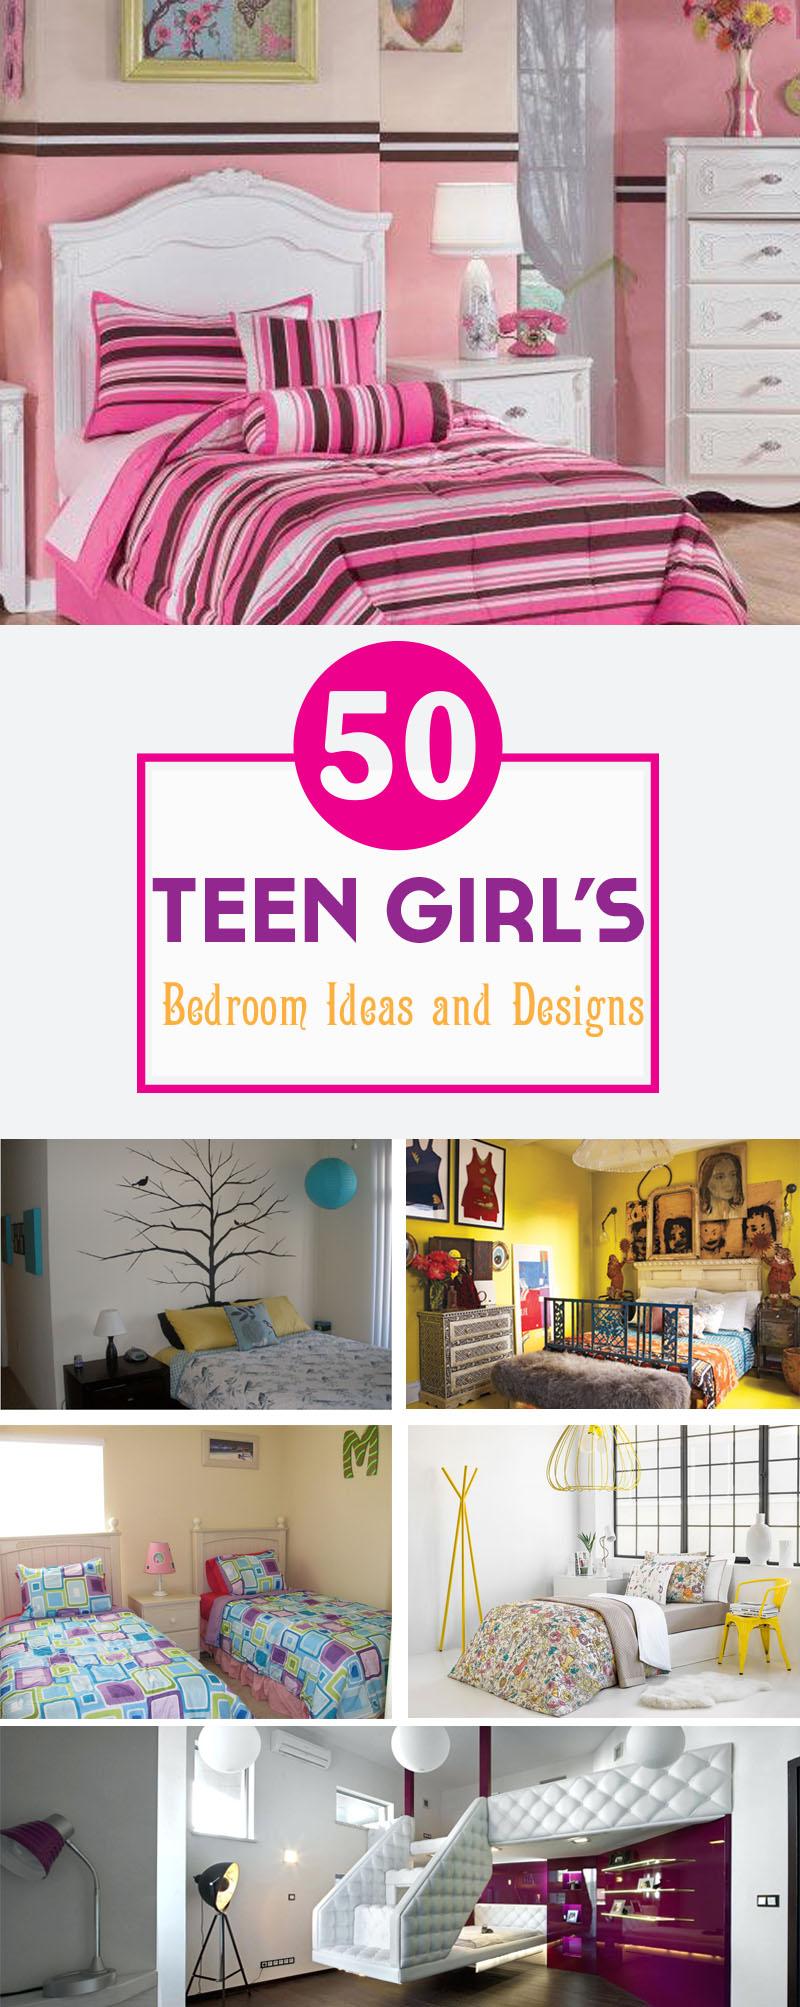 50 Excellent Teen Girl S Bedroom Ideas And Designs Interiorsherpa